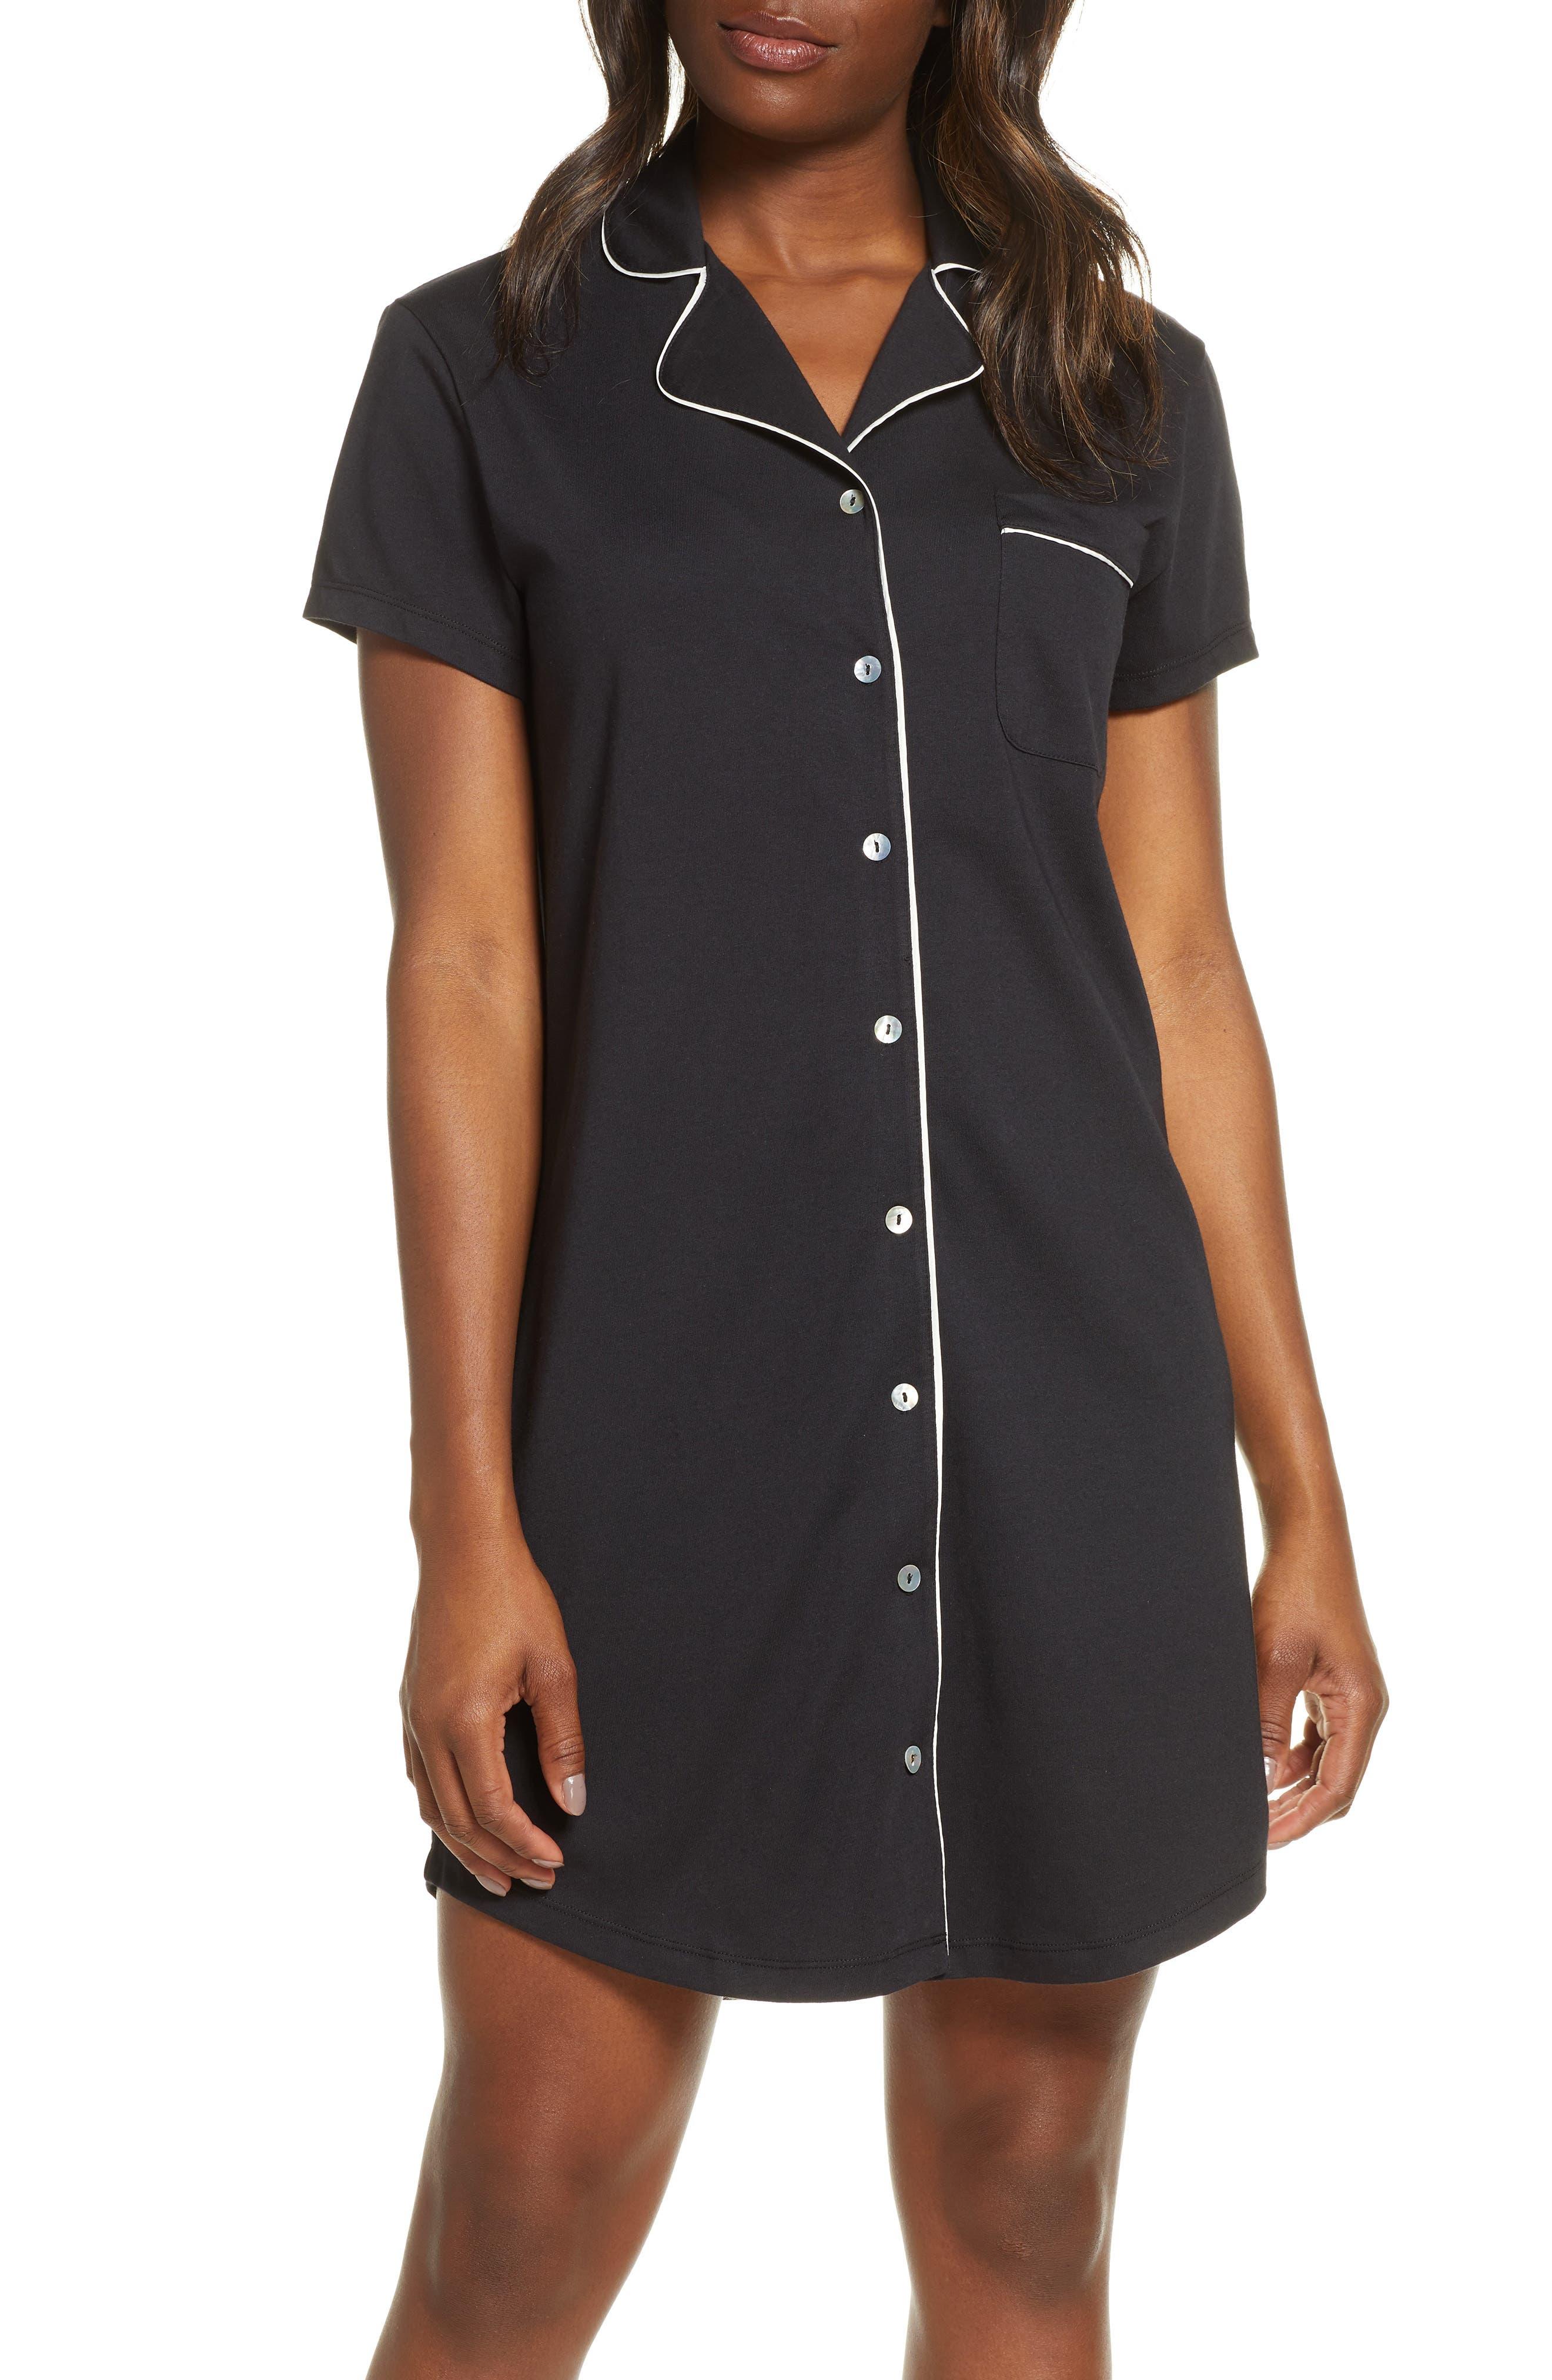 Lusome Marilyn Sleep Shirt